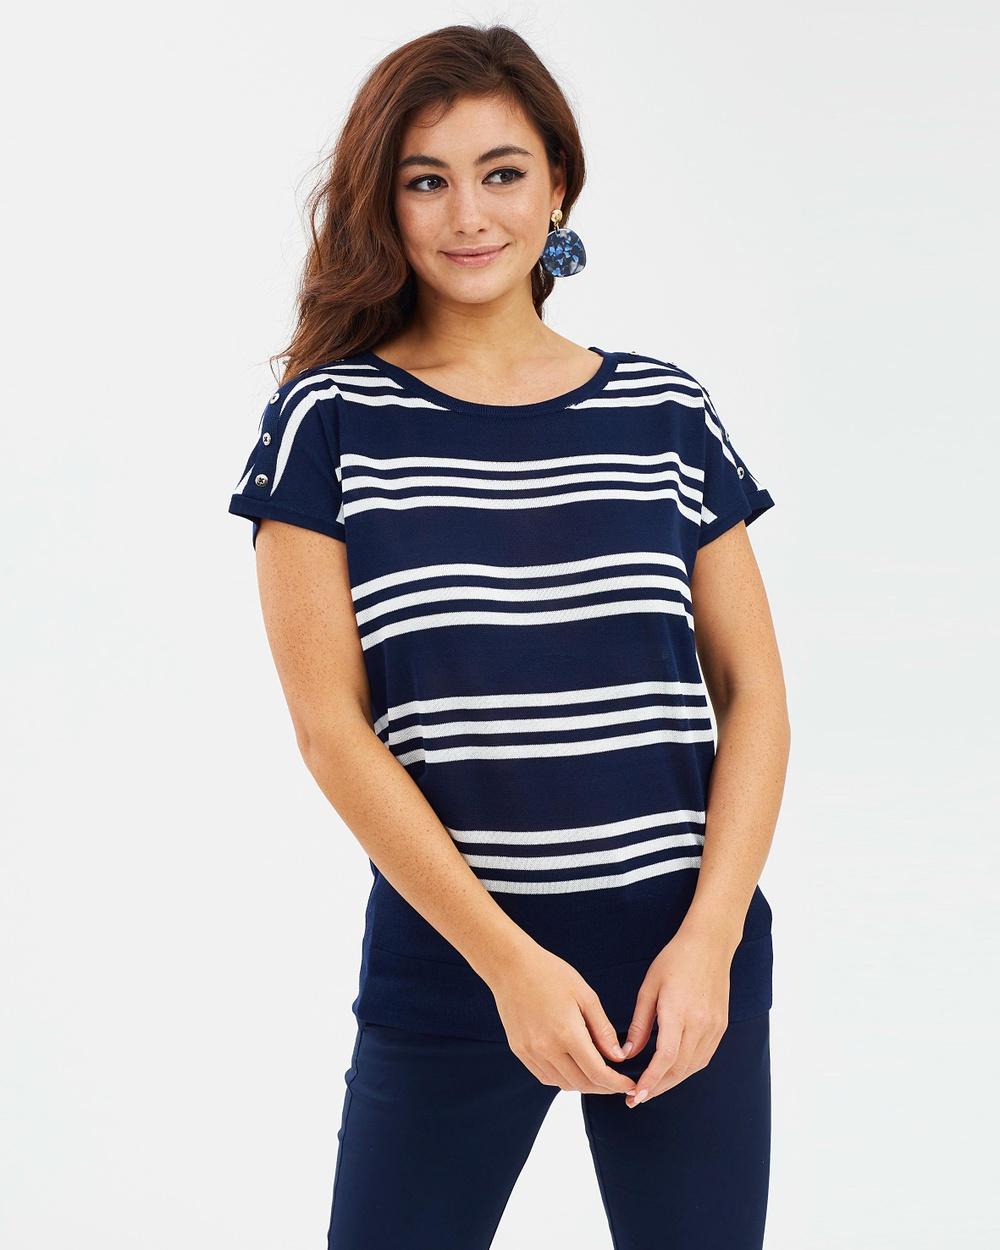 Wallis Short Sleeve Top Tops Navy Blue Short Sleeve Top